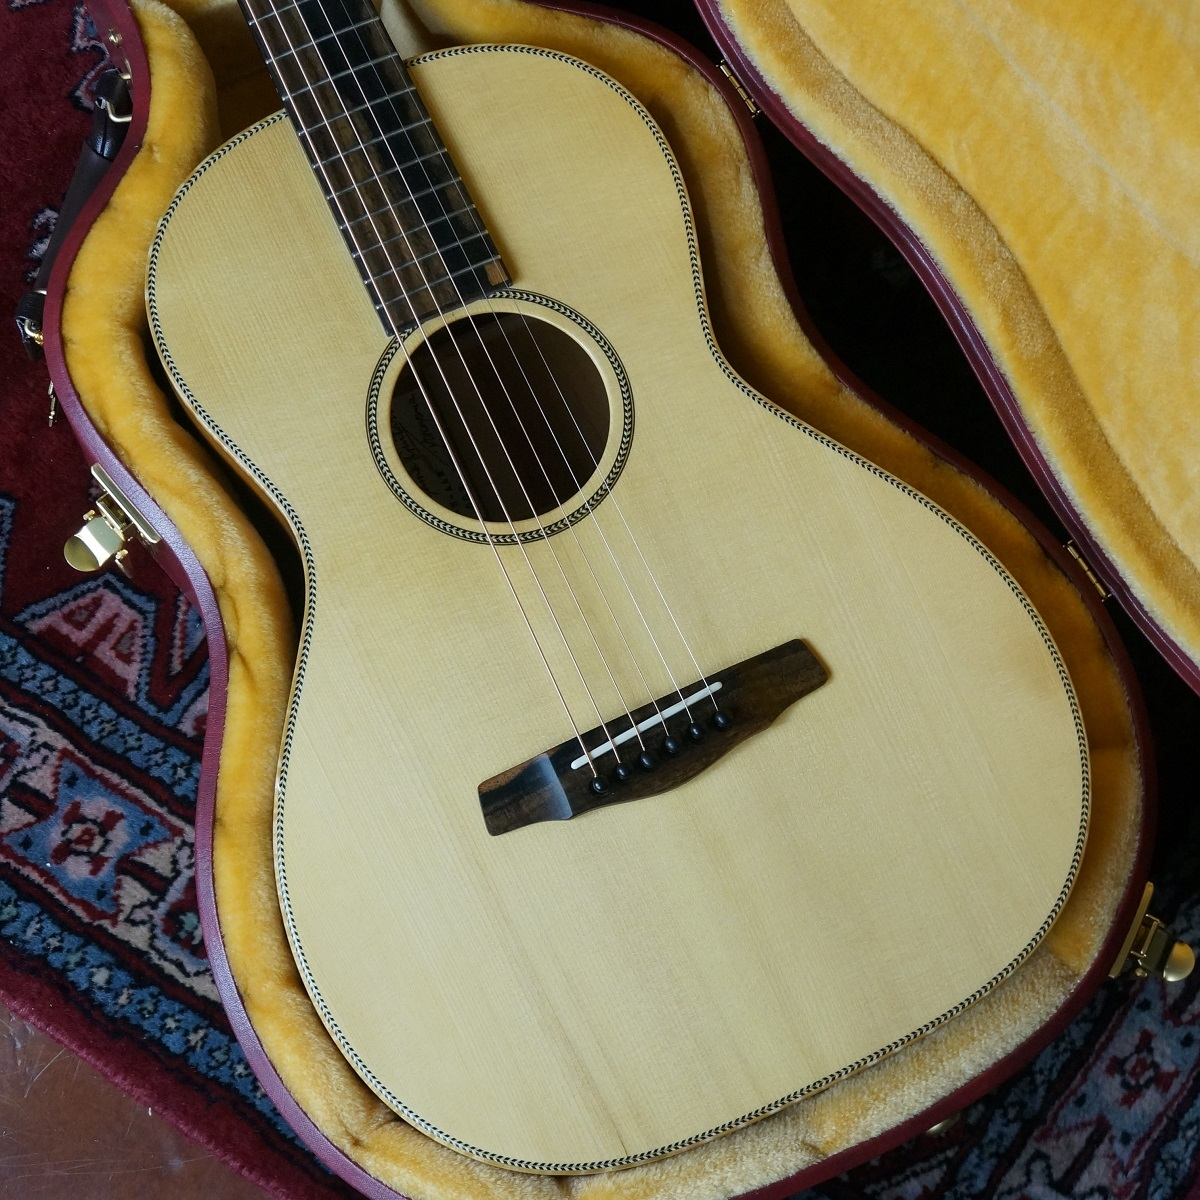 Yokoyama Guitars SNN-AAM - Special Model - #862 【当店と横山工房コラボ企画のスペシャルモデル。】